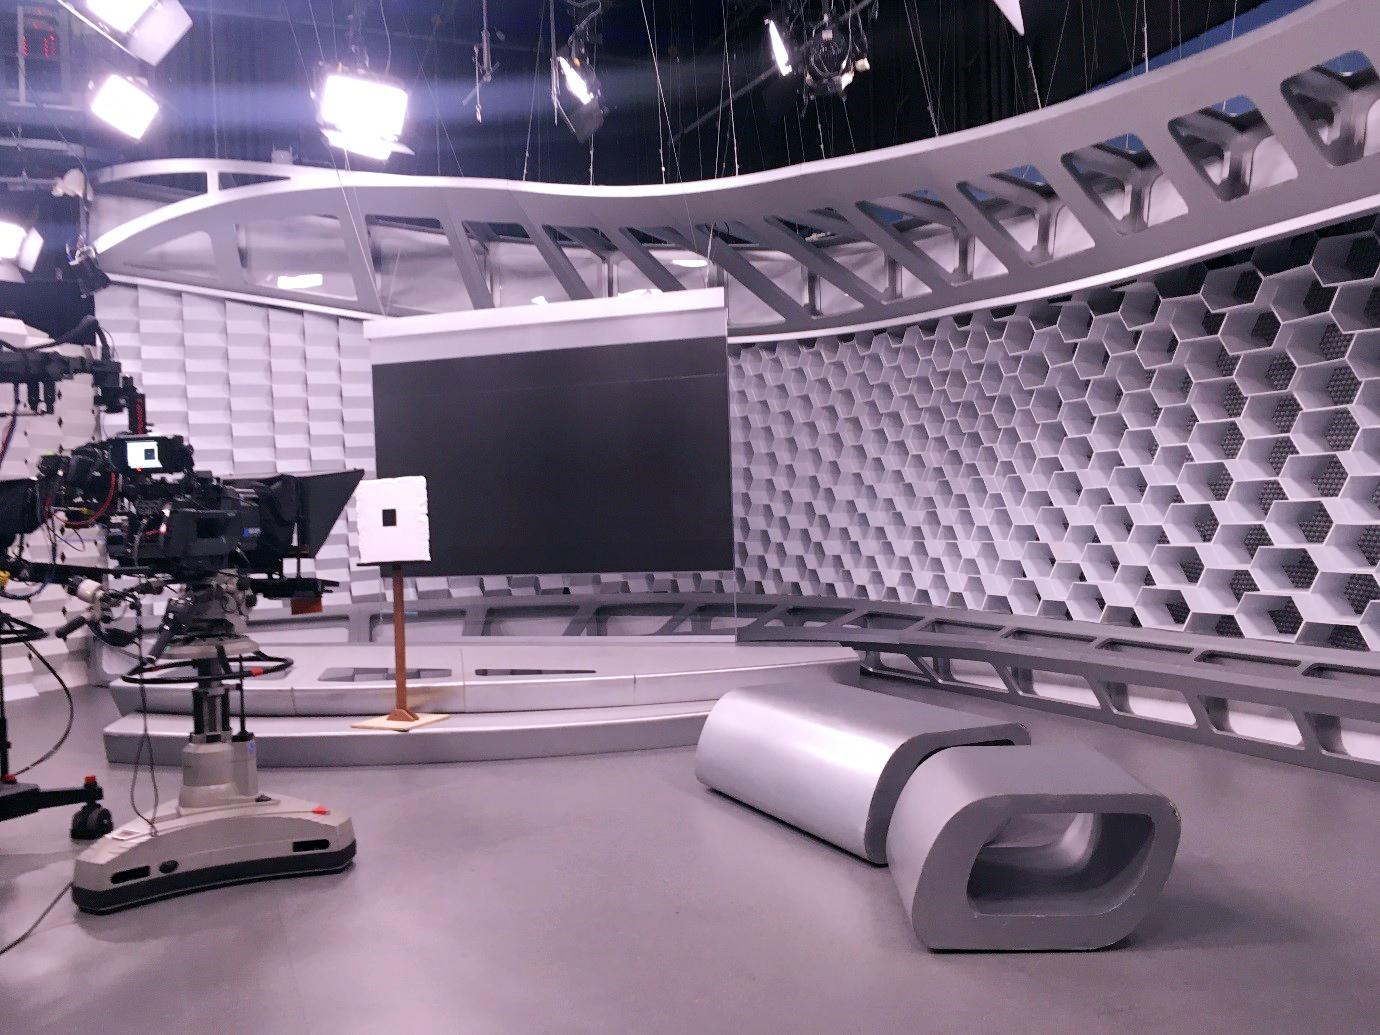 Alunos de Jornalismo visitam os estúdios da Rede Globo